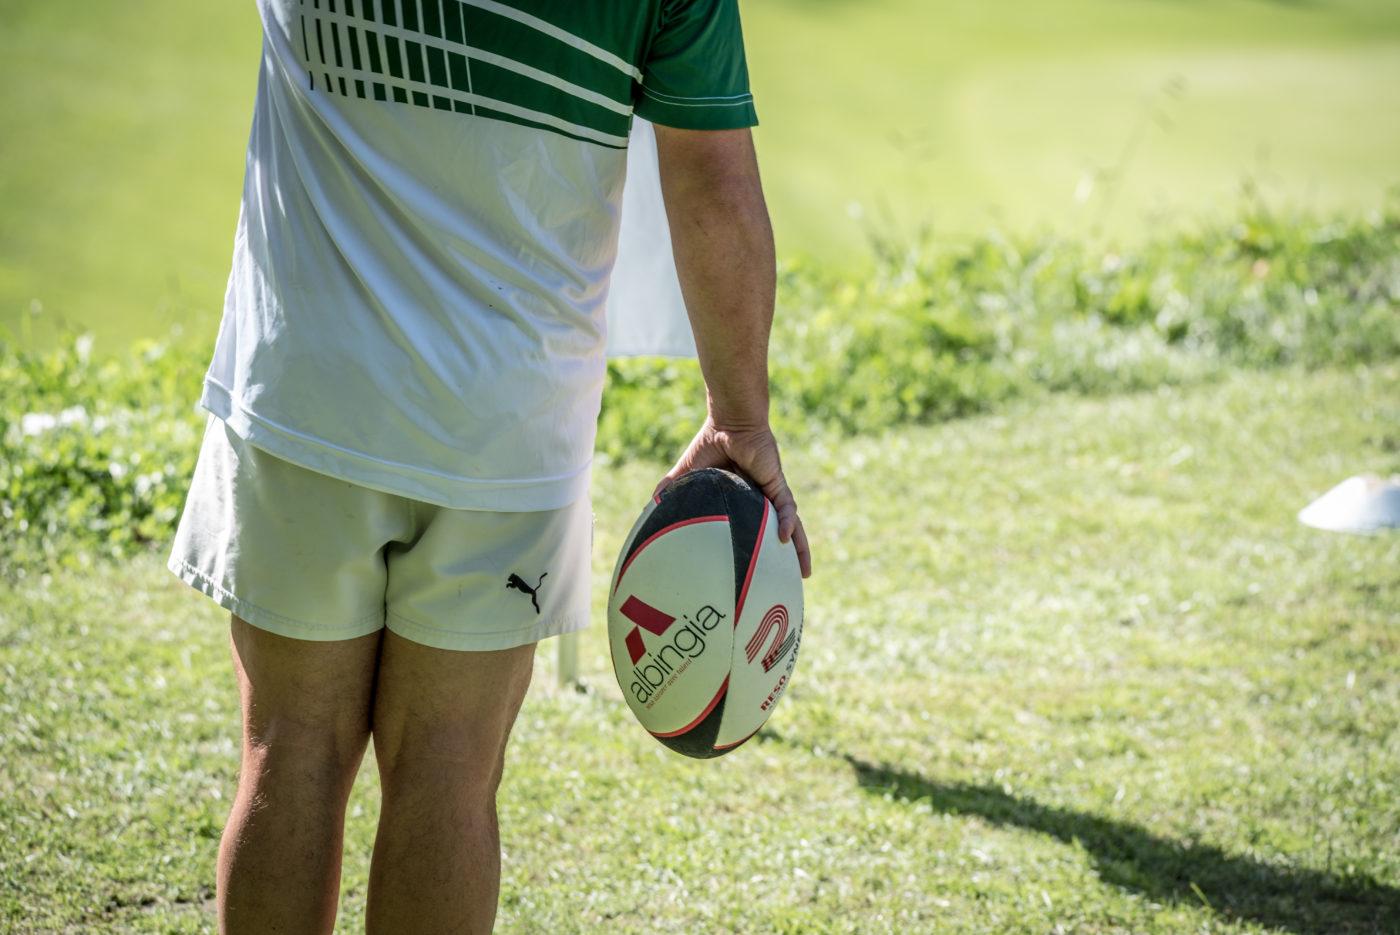 Événement Rugby Golf IRPB 2019 Chantaco Inter réseau Pays basque Agence Erronda albingia